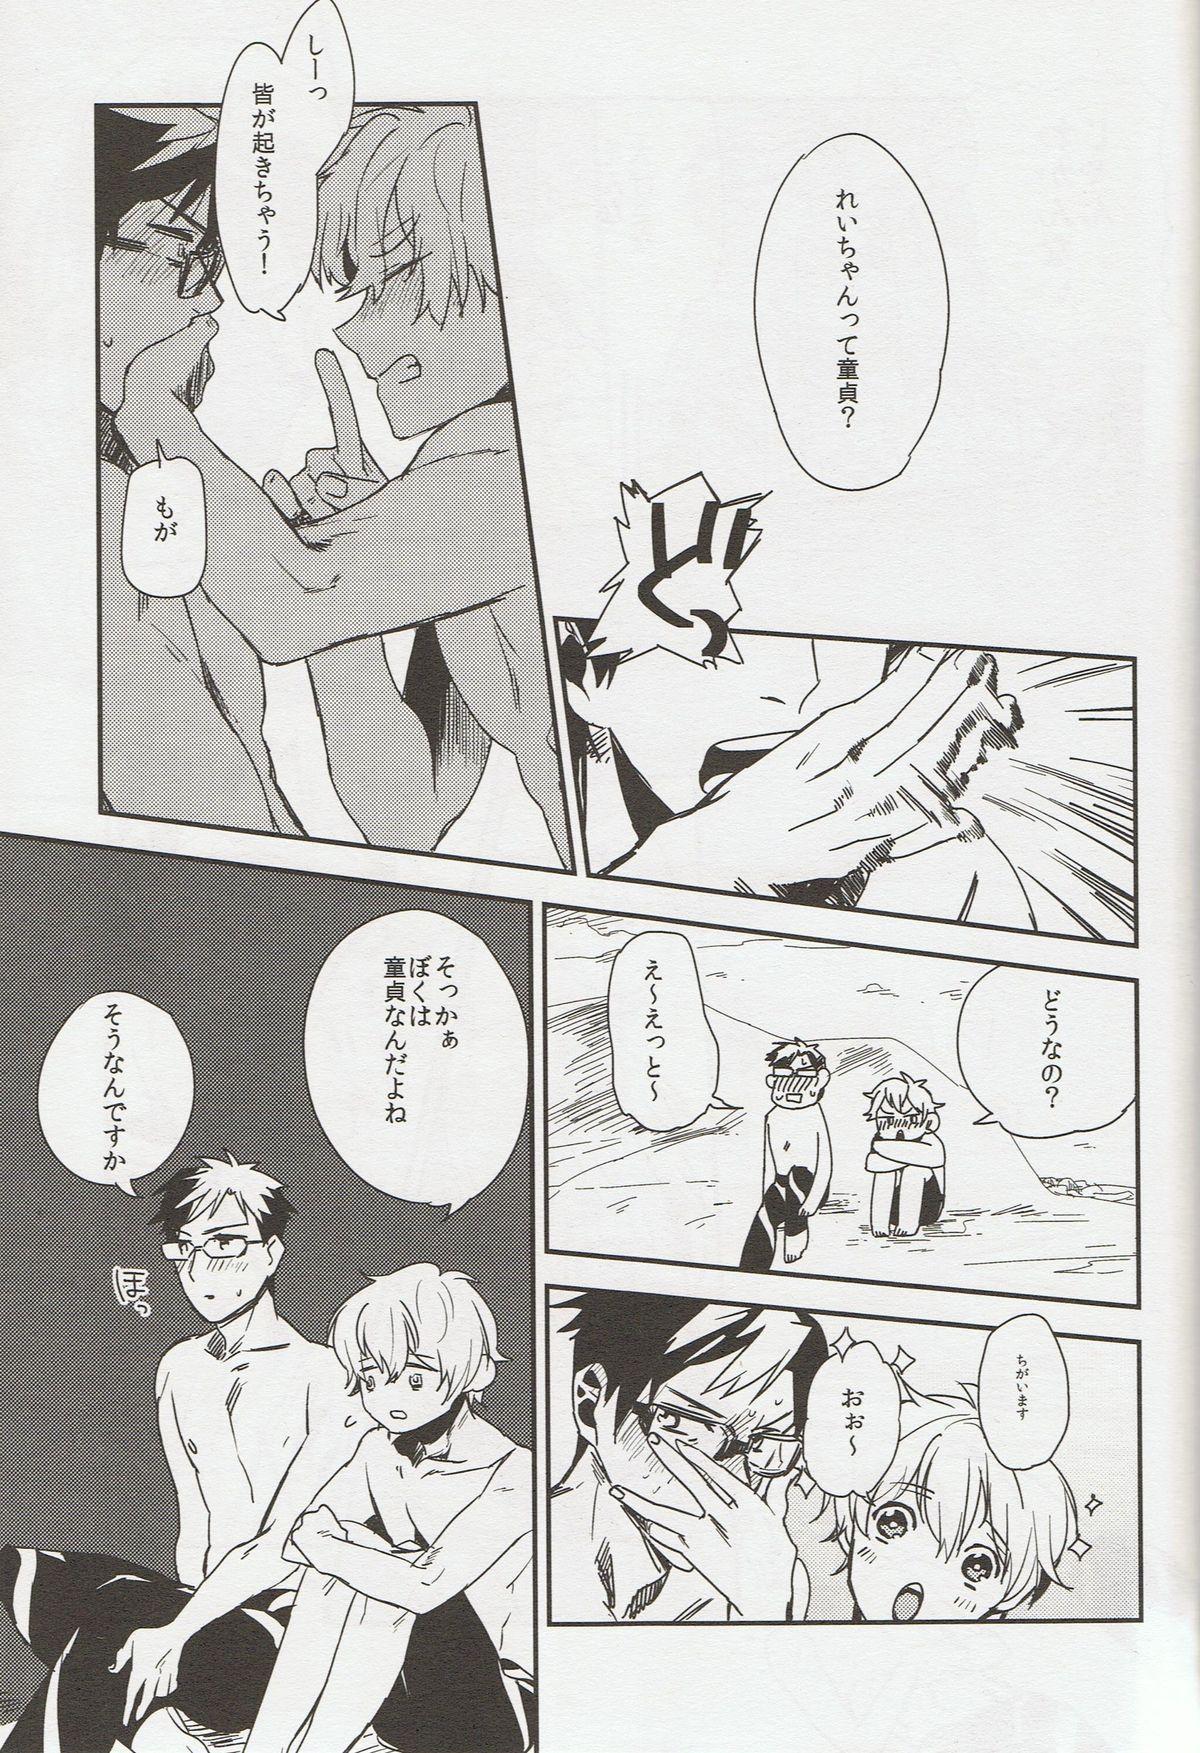 Sou da, Tottori Sakyuu Ikou. 39